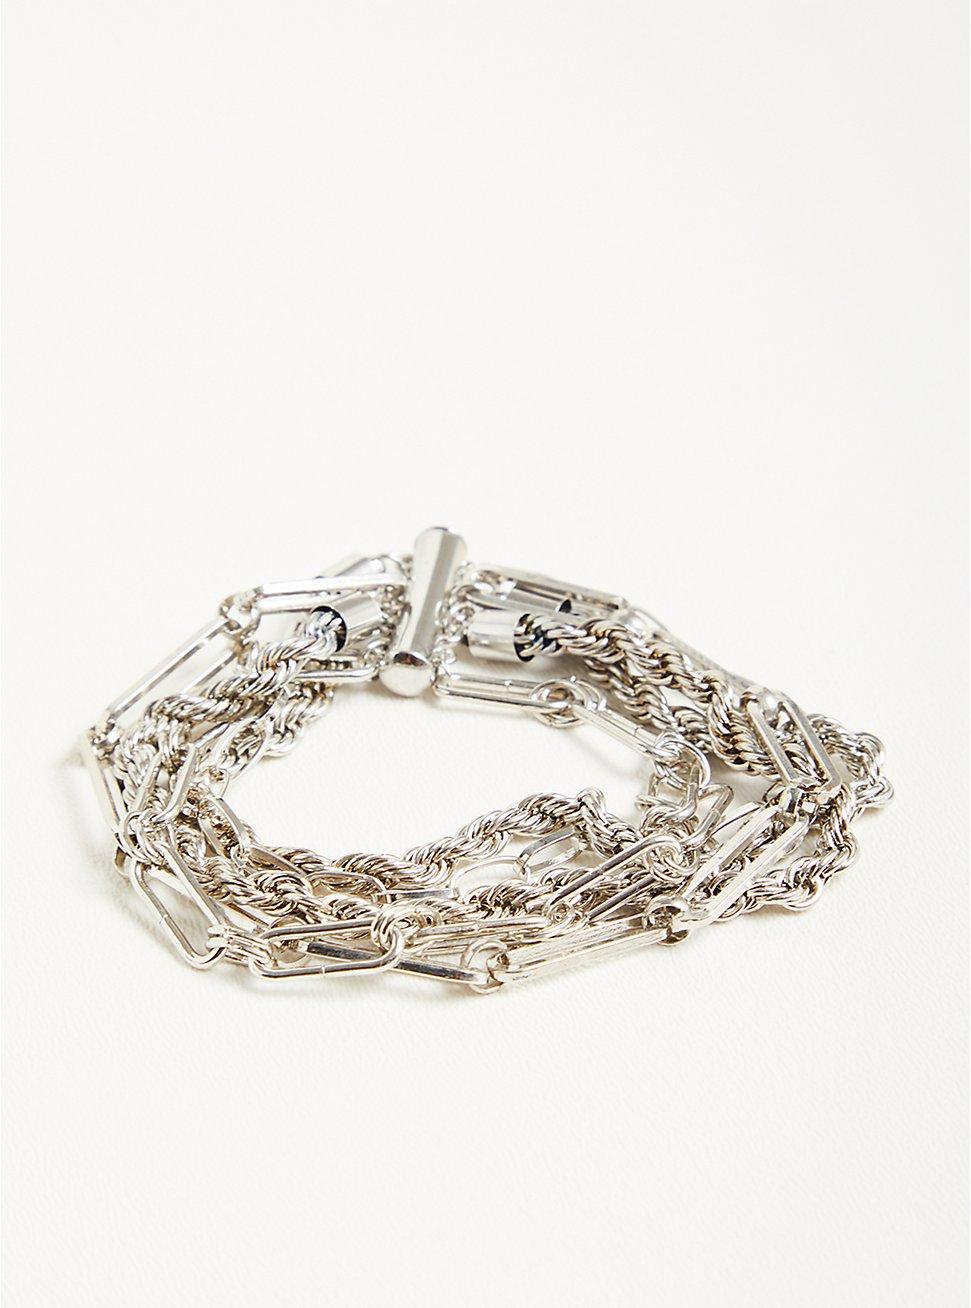 Plus Size Mixed Chain Magnetic Bracelet - Silver Tone, SILVER, hi-res